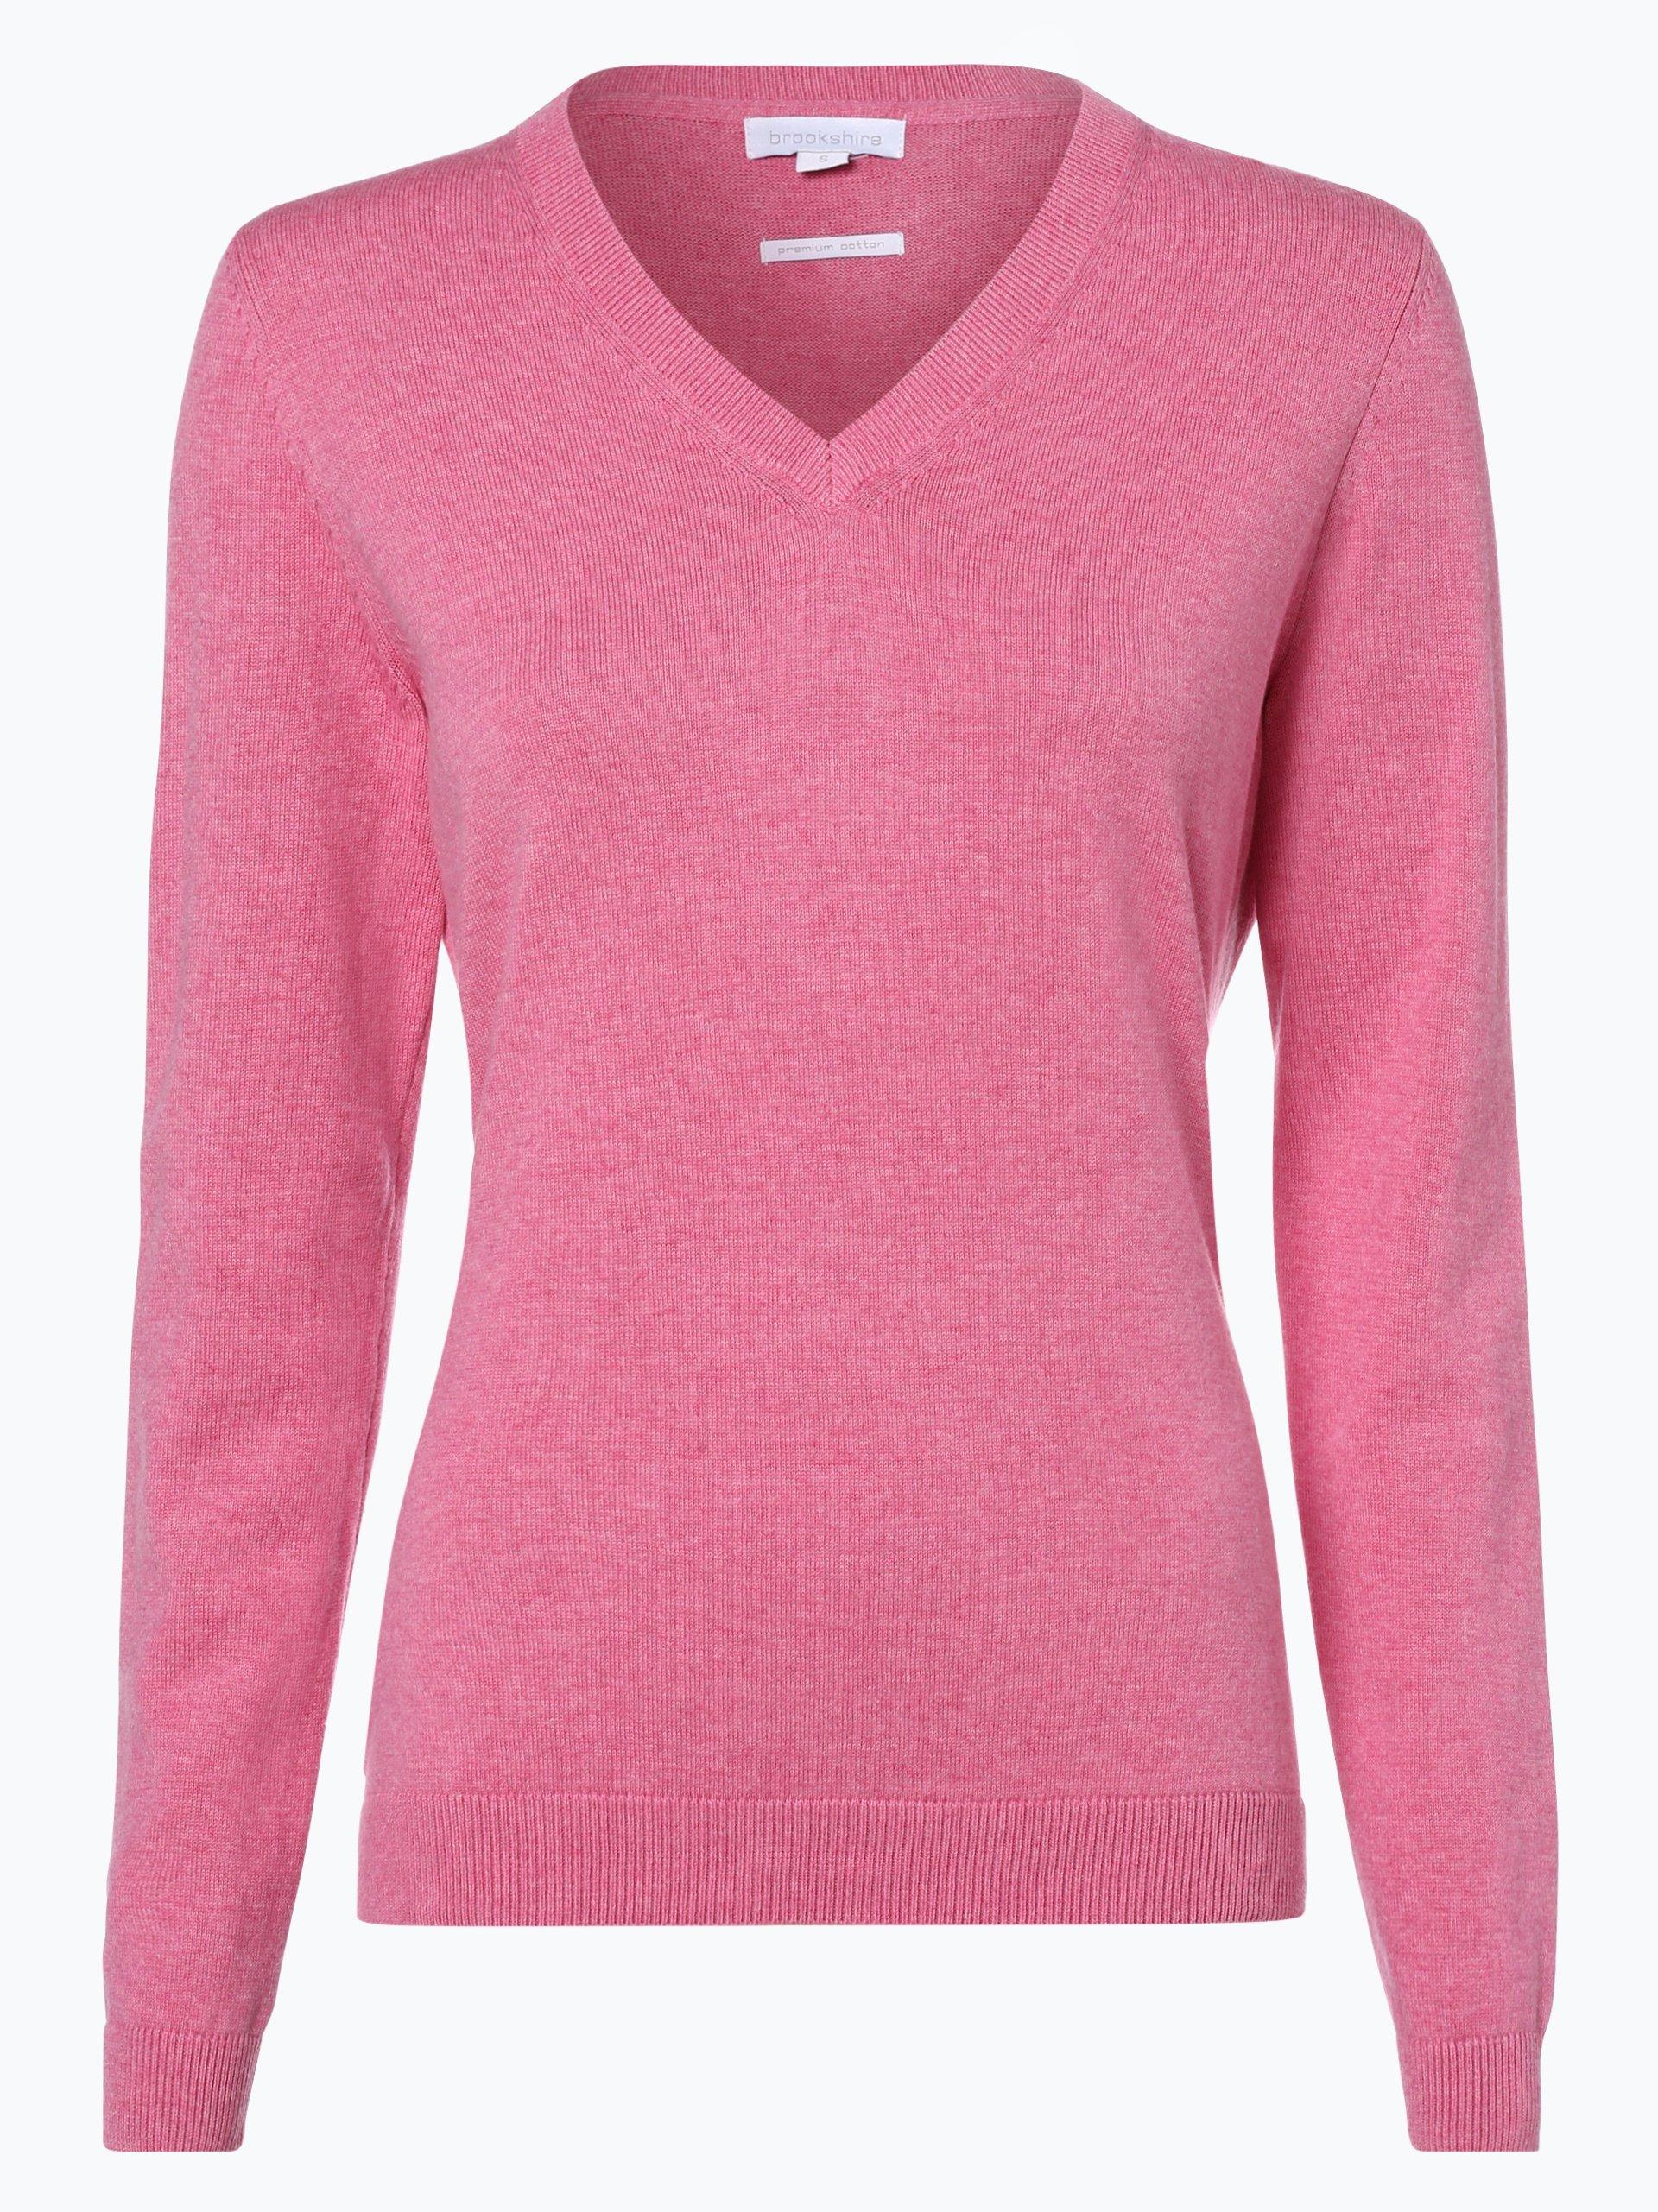 brookshire damen pullover pink uni online kaufen. Black Bedroom Furniture Sets. Home Design Ideas